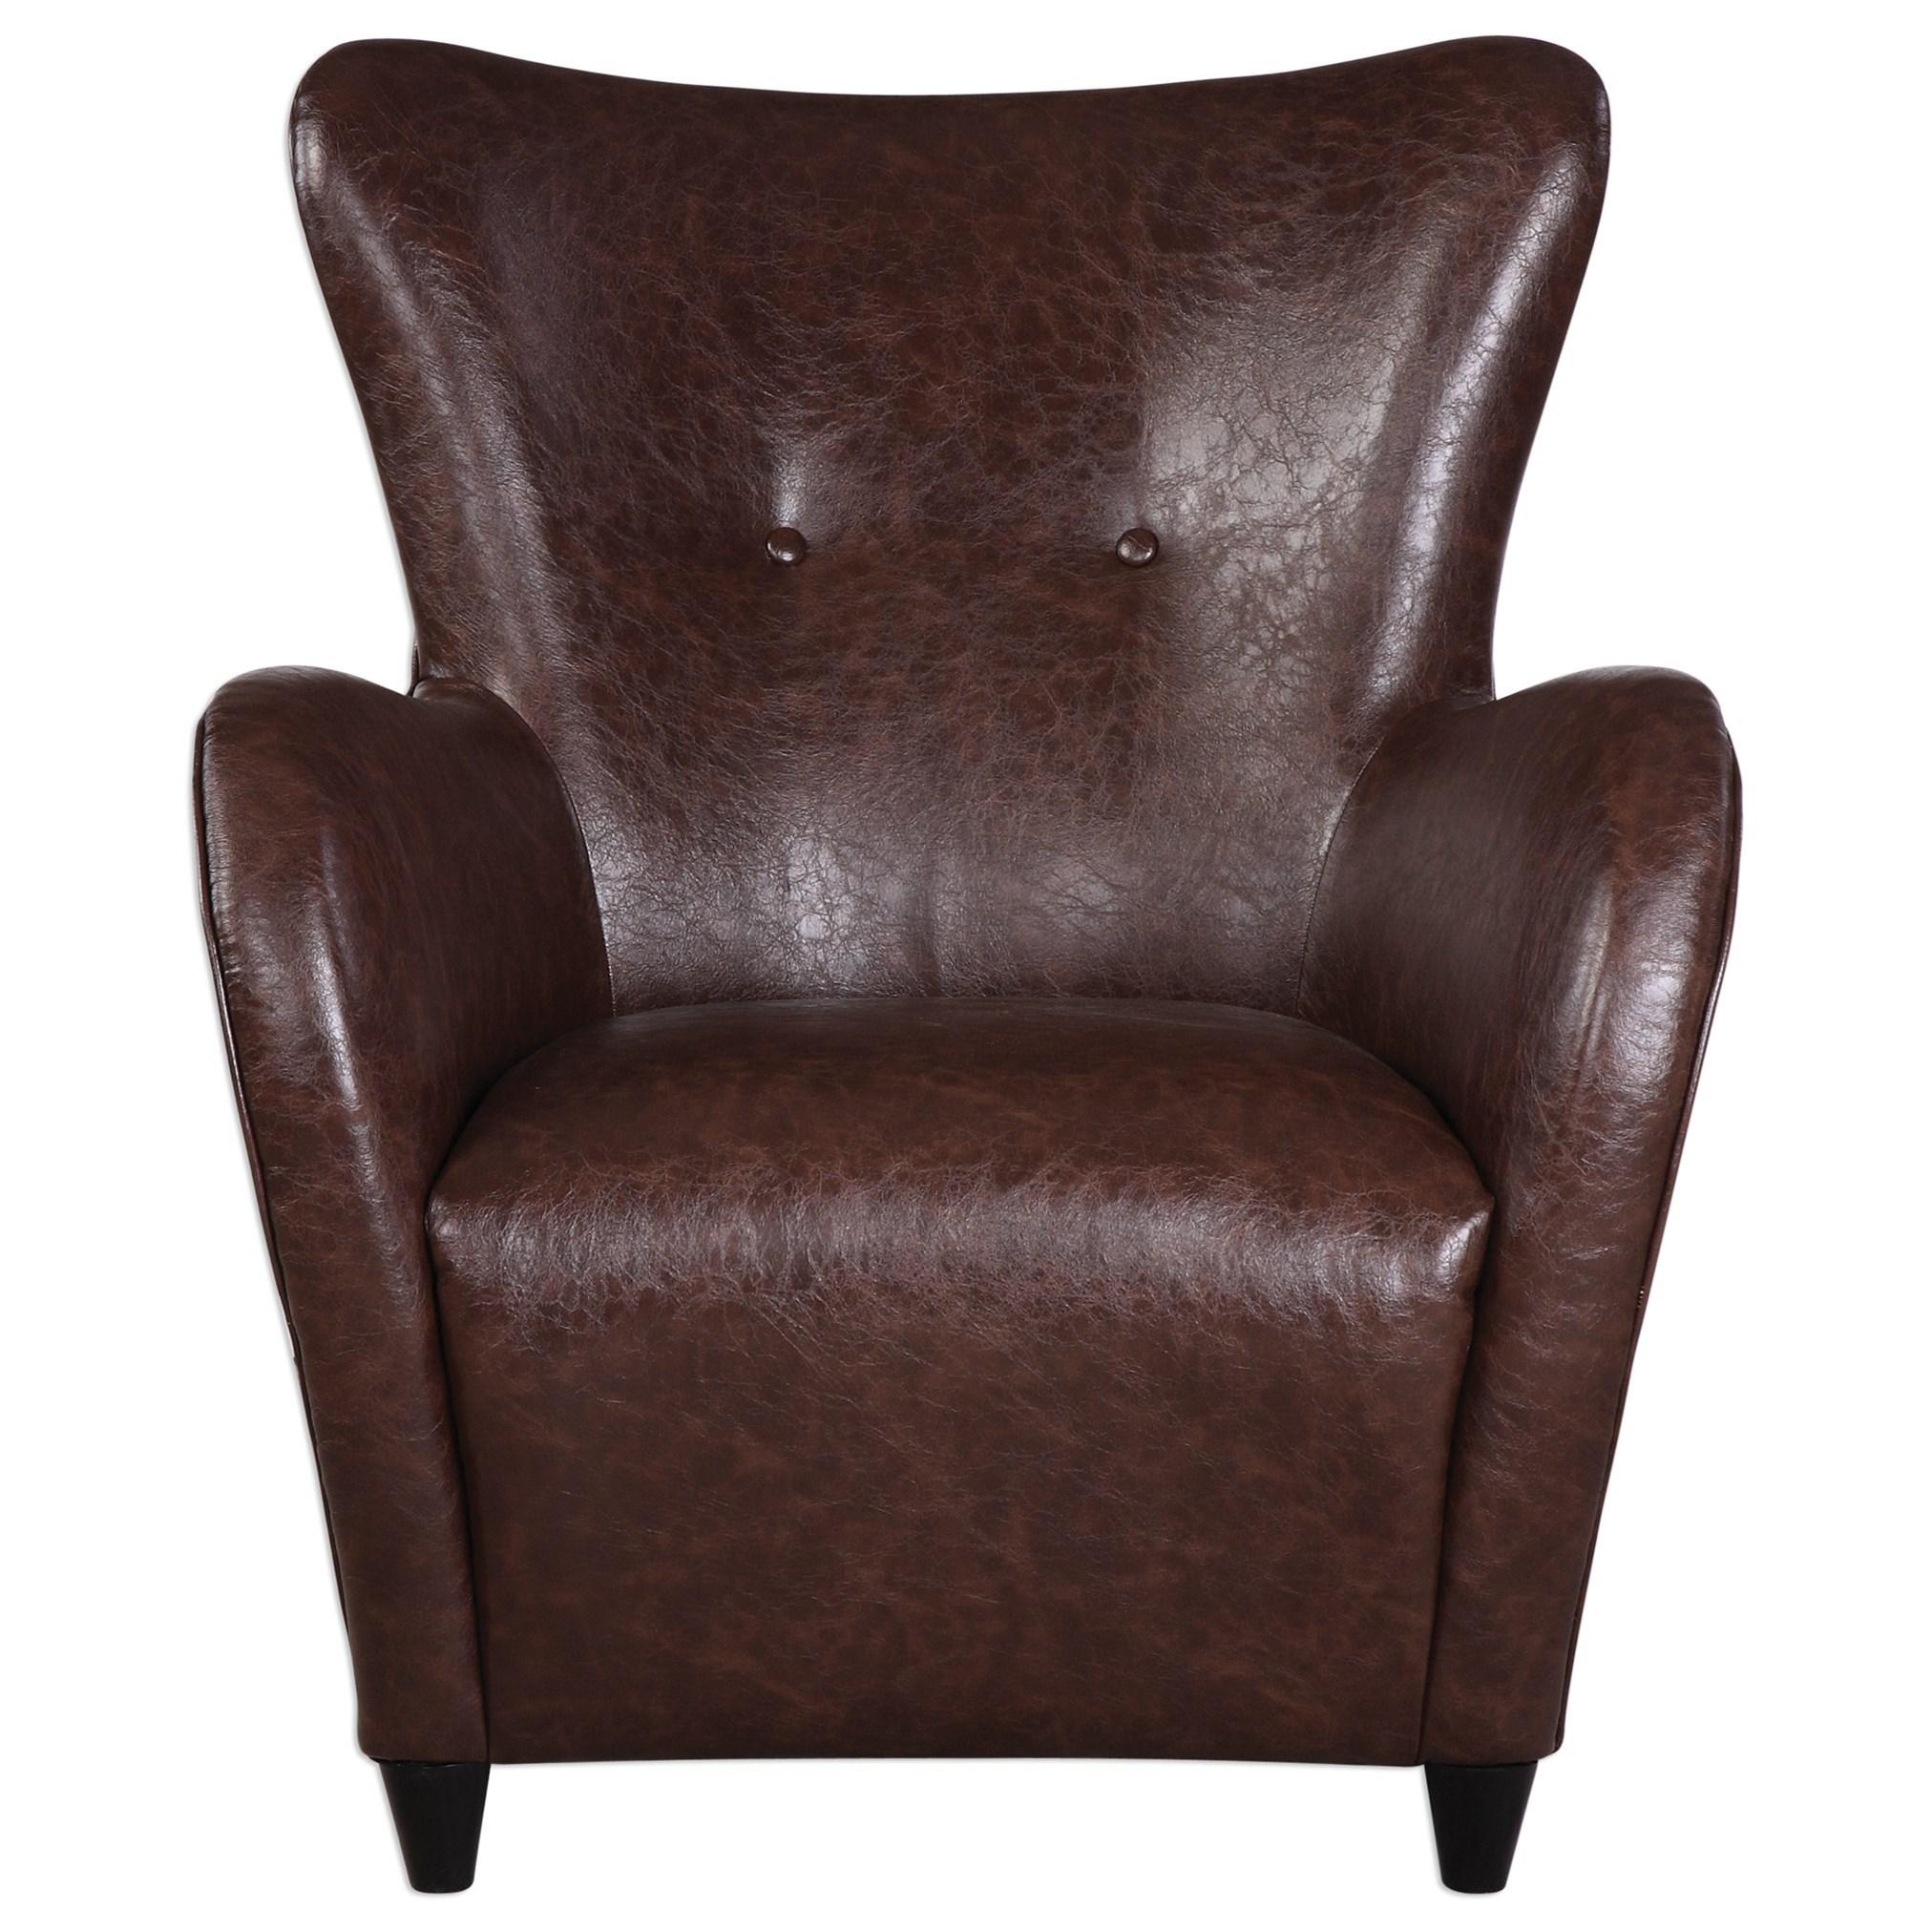 Uttermost Accent Furniture Lyric Accent Chair Dunk